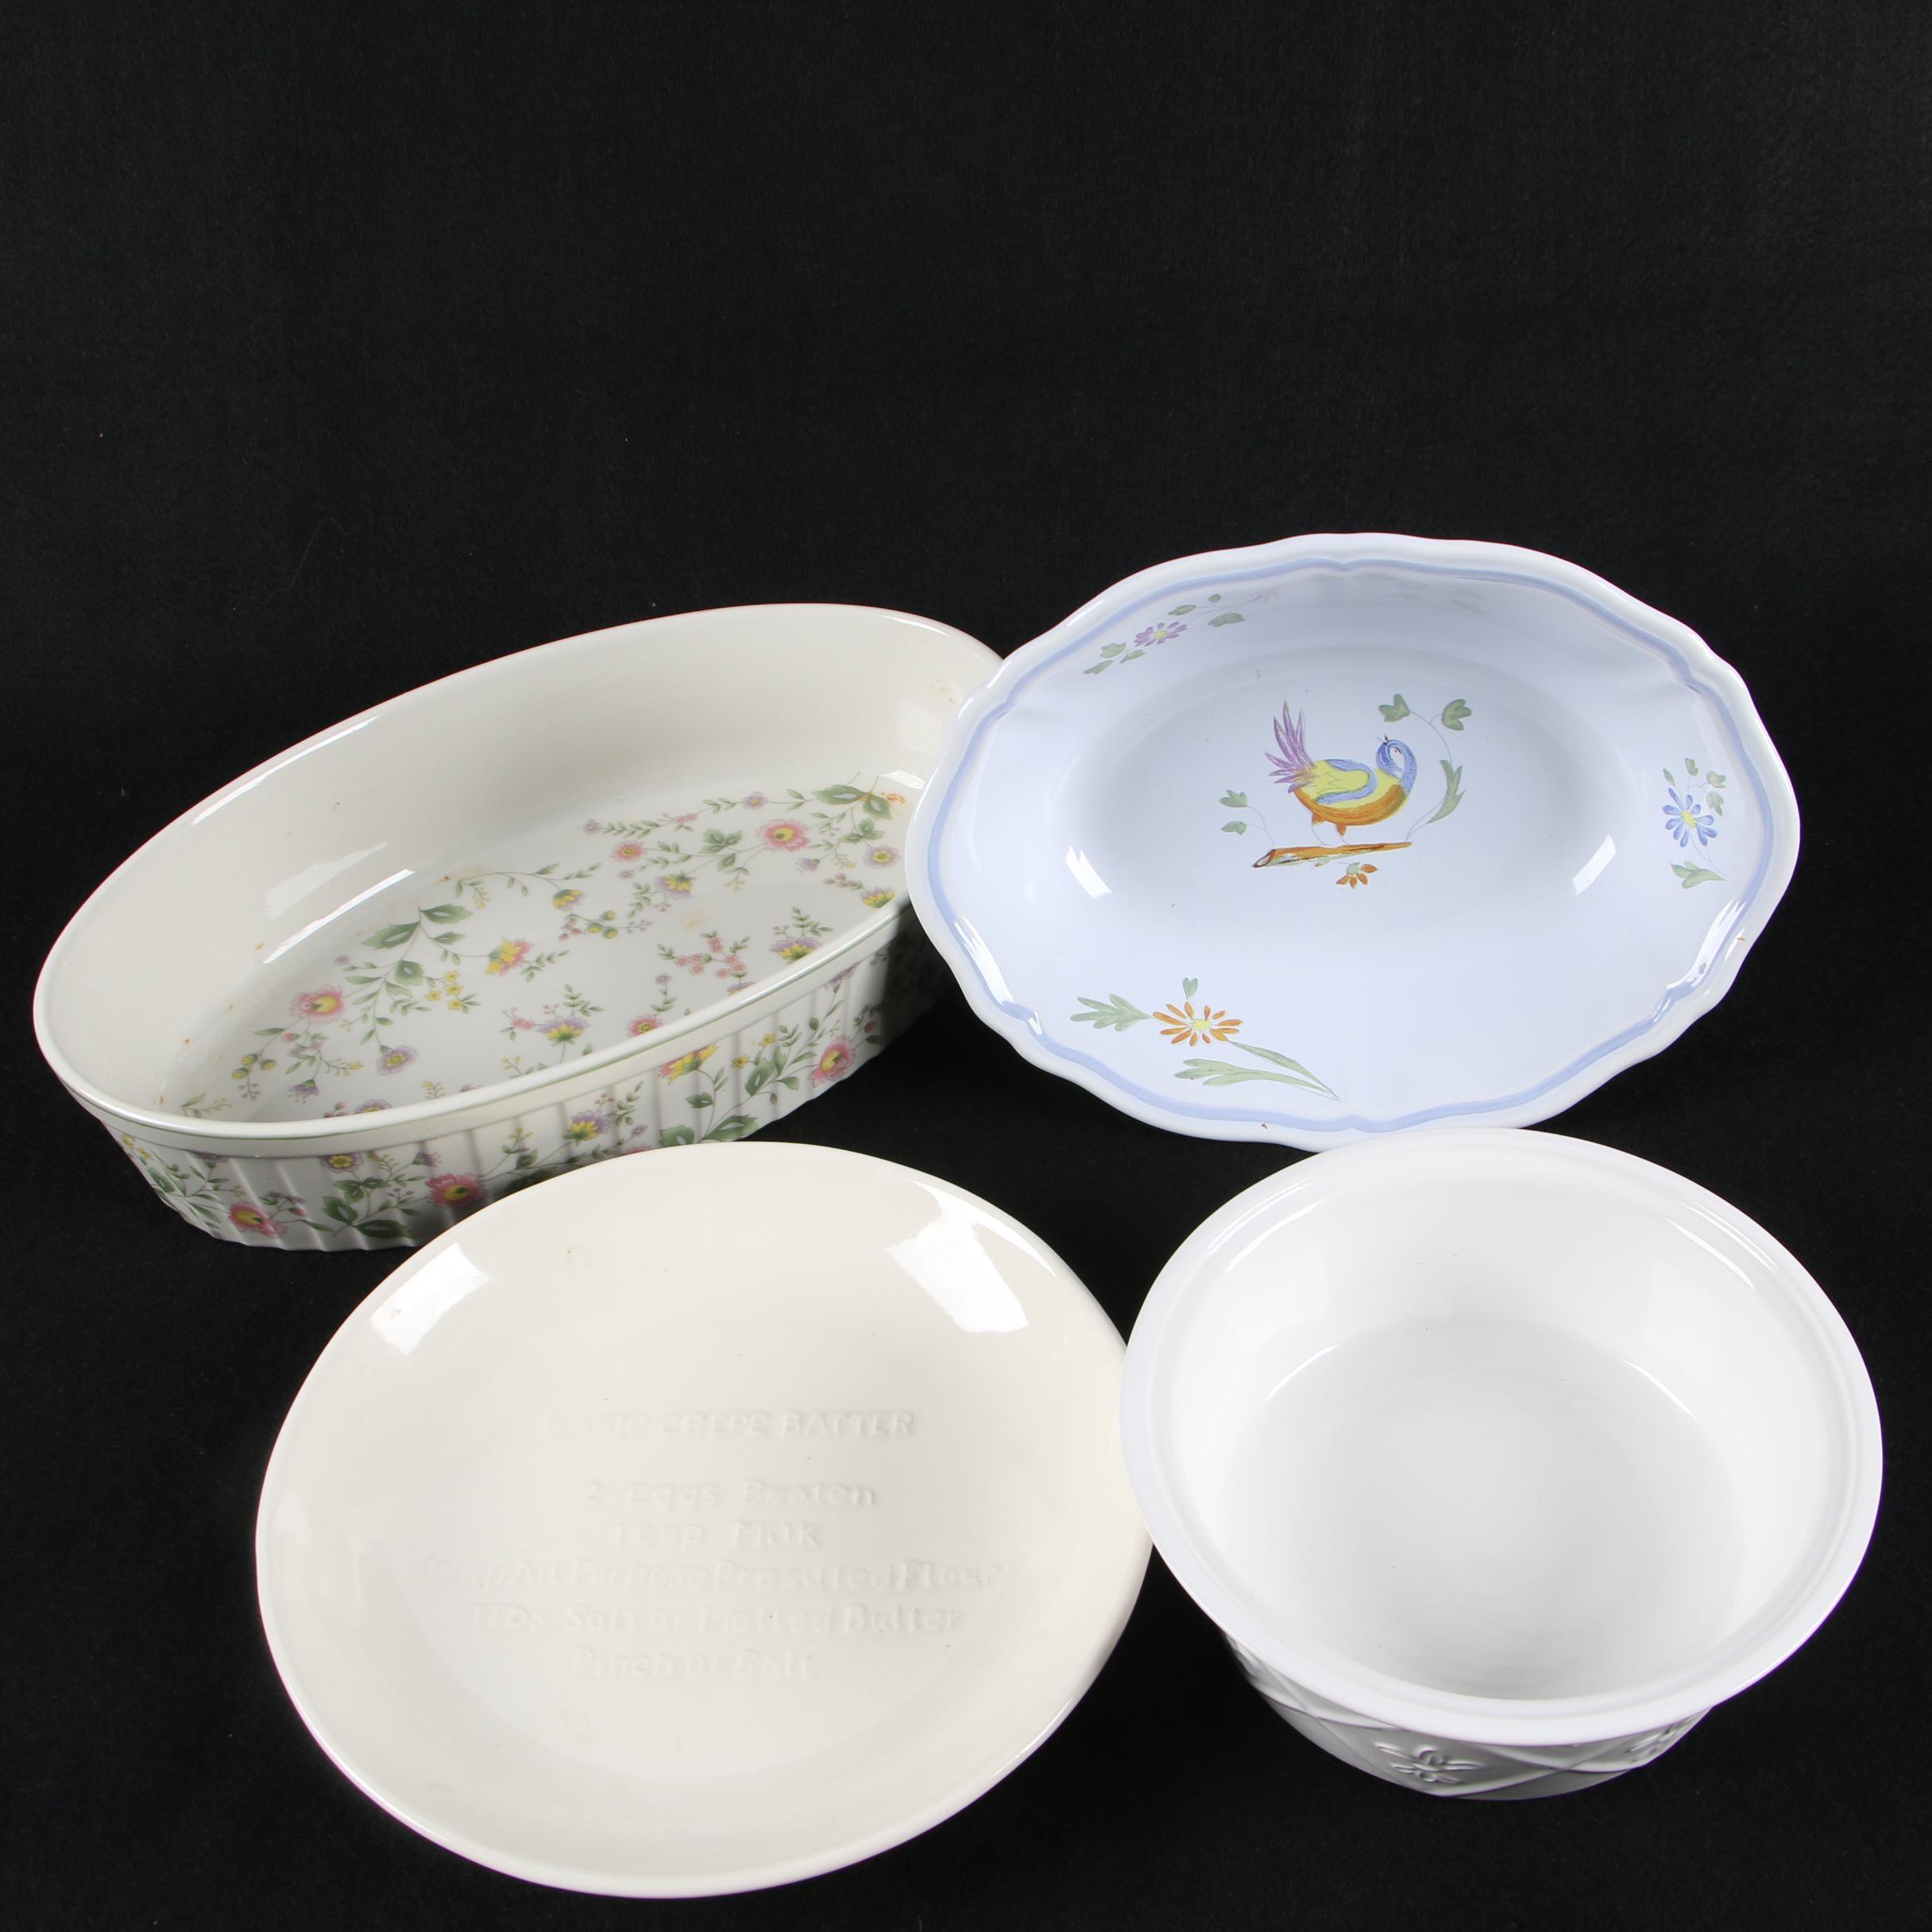 Bakeware and Serveware Featuring Longchamp